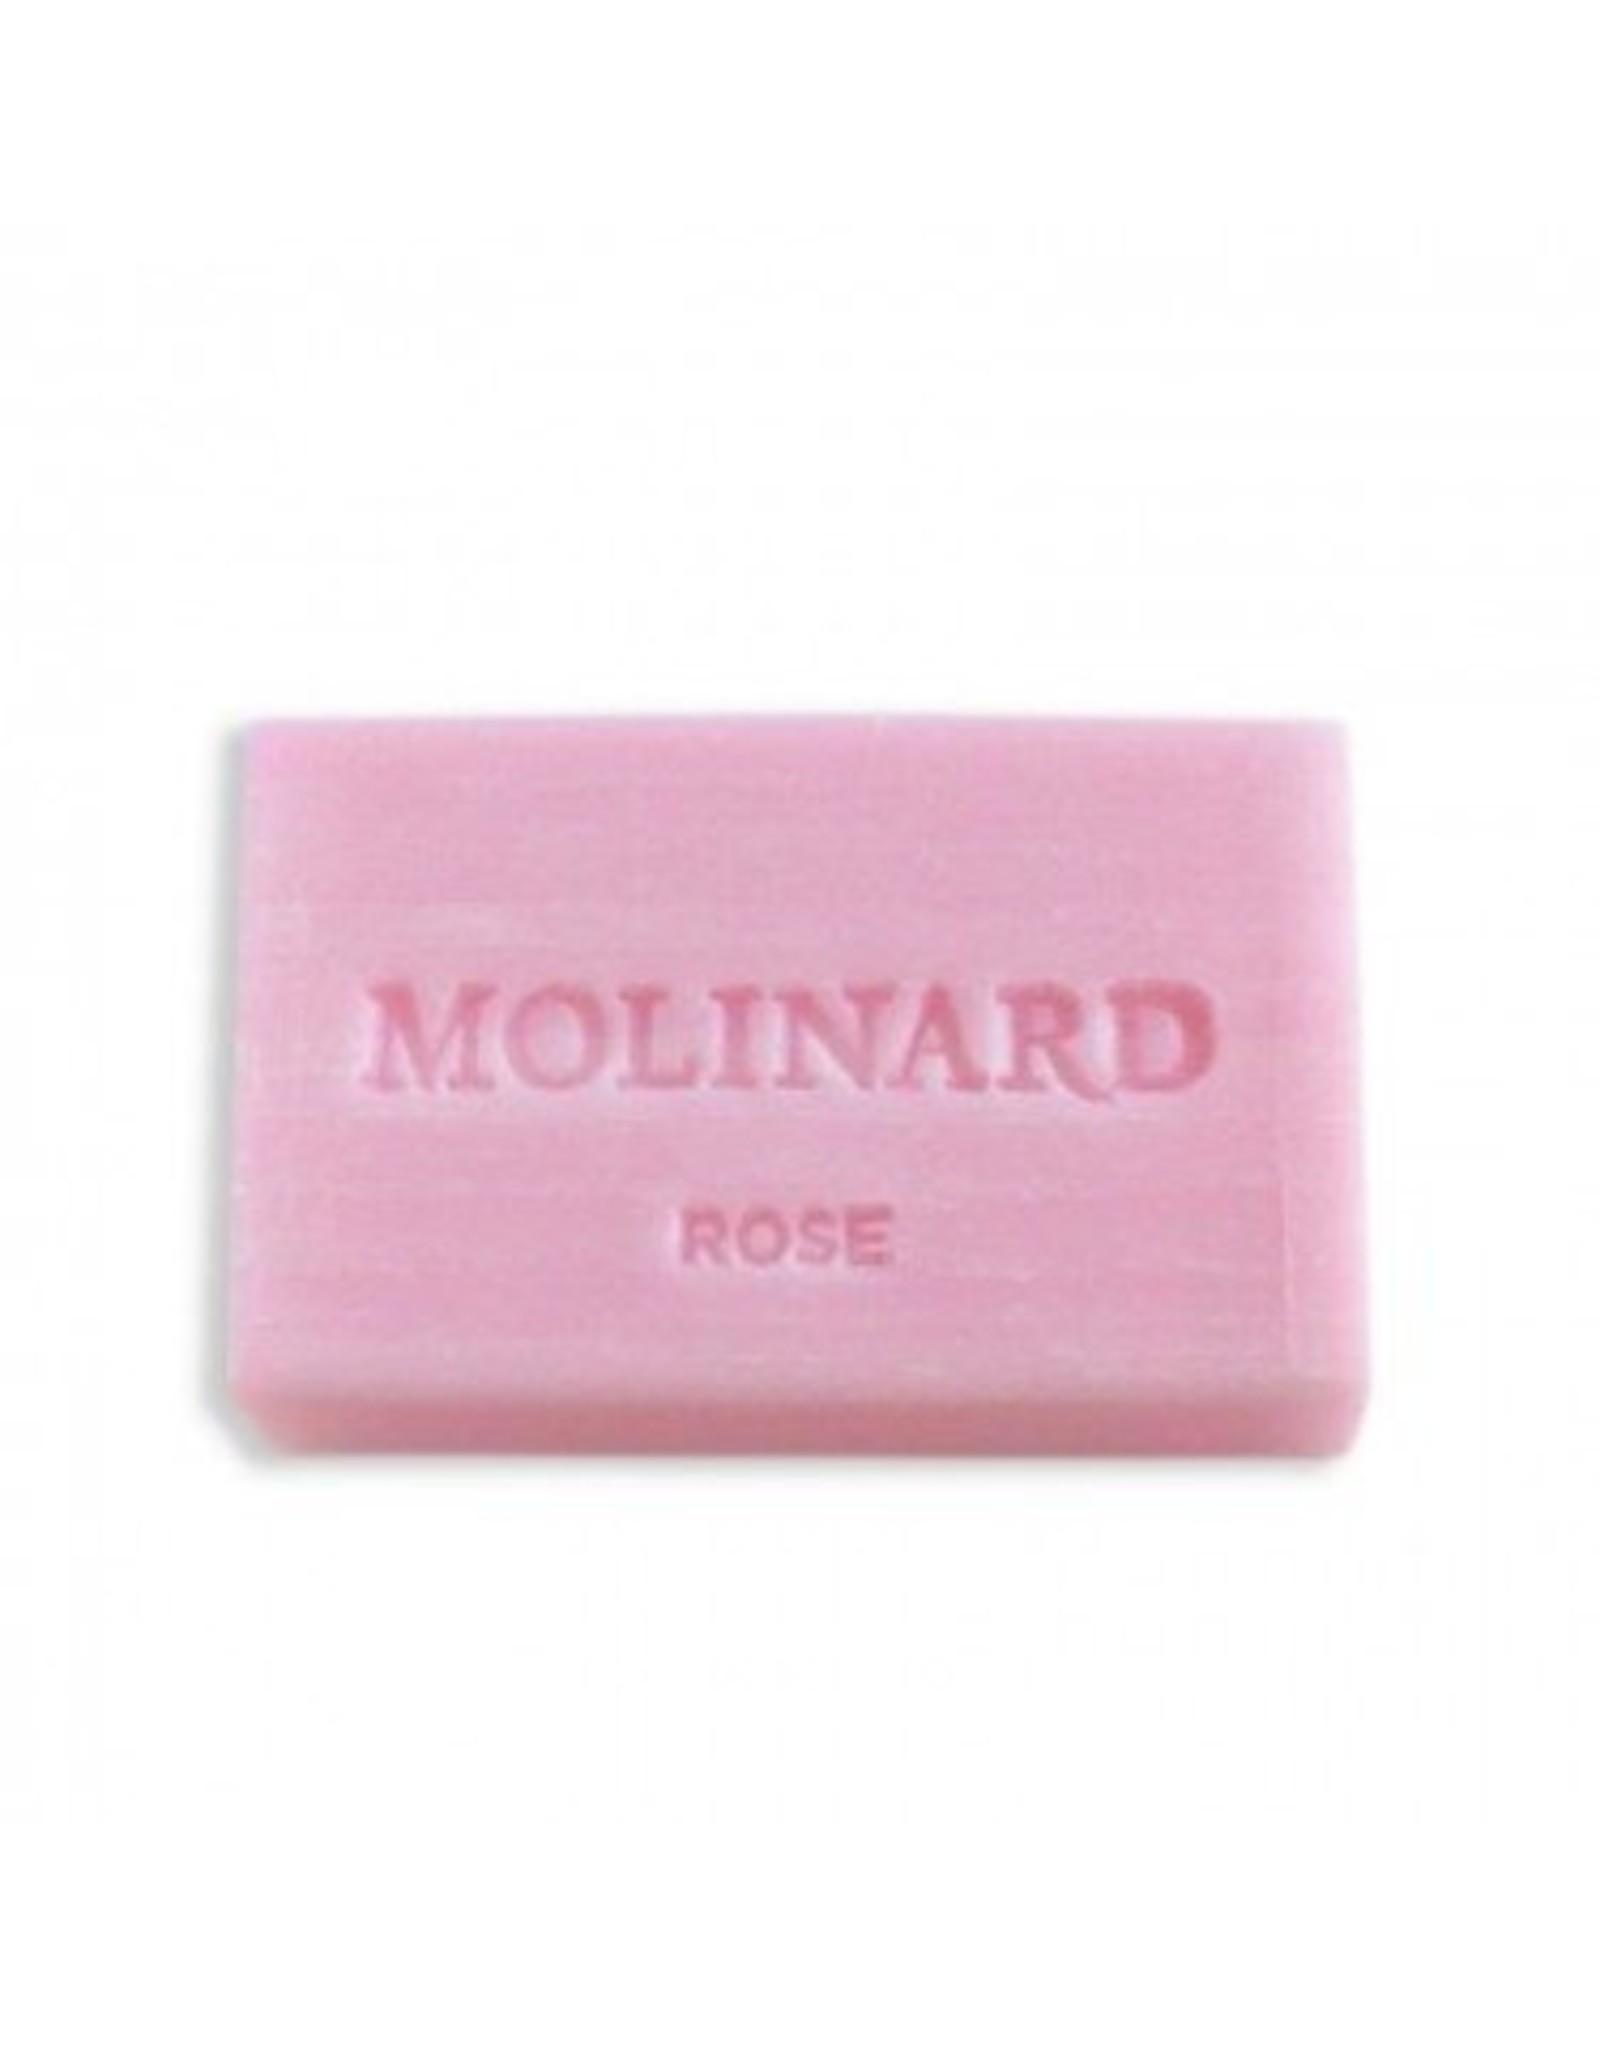 Molinard Coffret Rose - Les Savons Artisanaux de Molinard